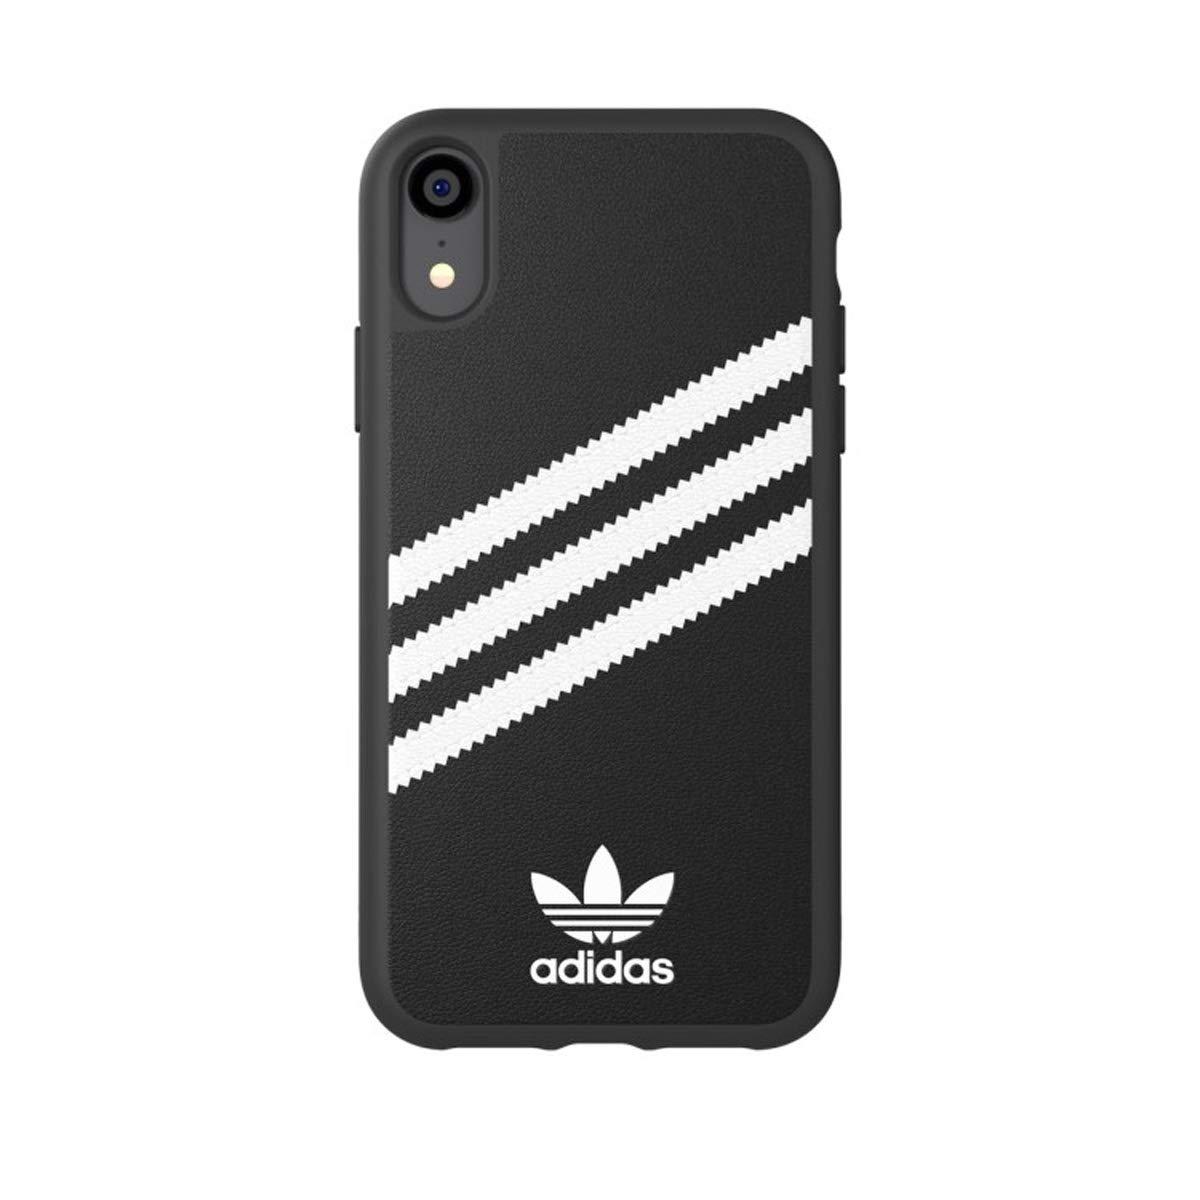 sale retailer a79c2 257a5 Amazon.com  adidas Originals Moulded Case PU for iPhone XR - Black White   Cell Phones   Accessories